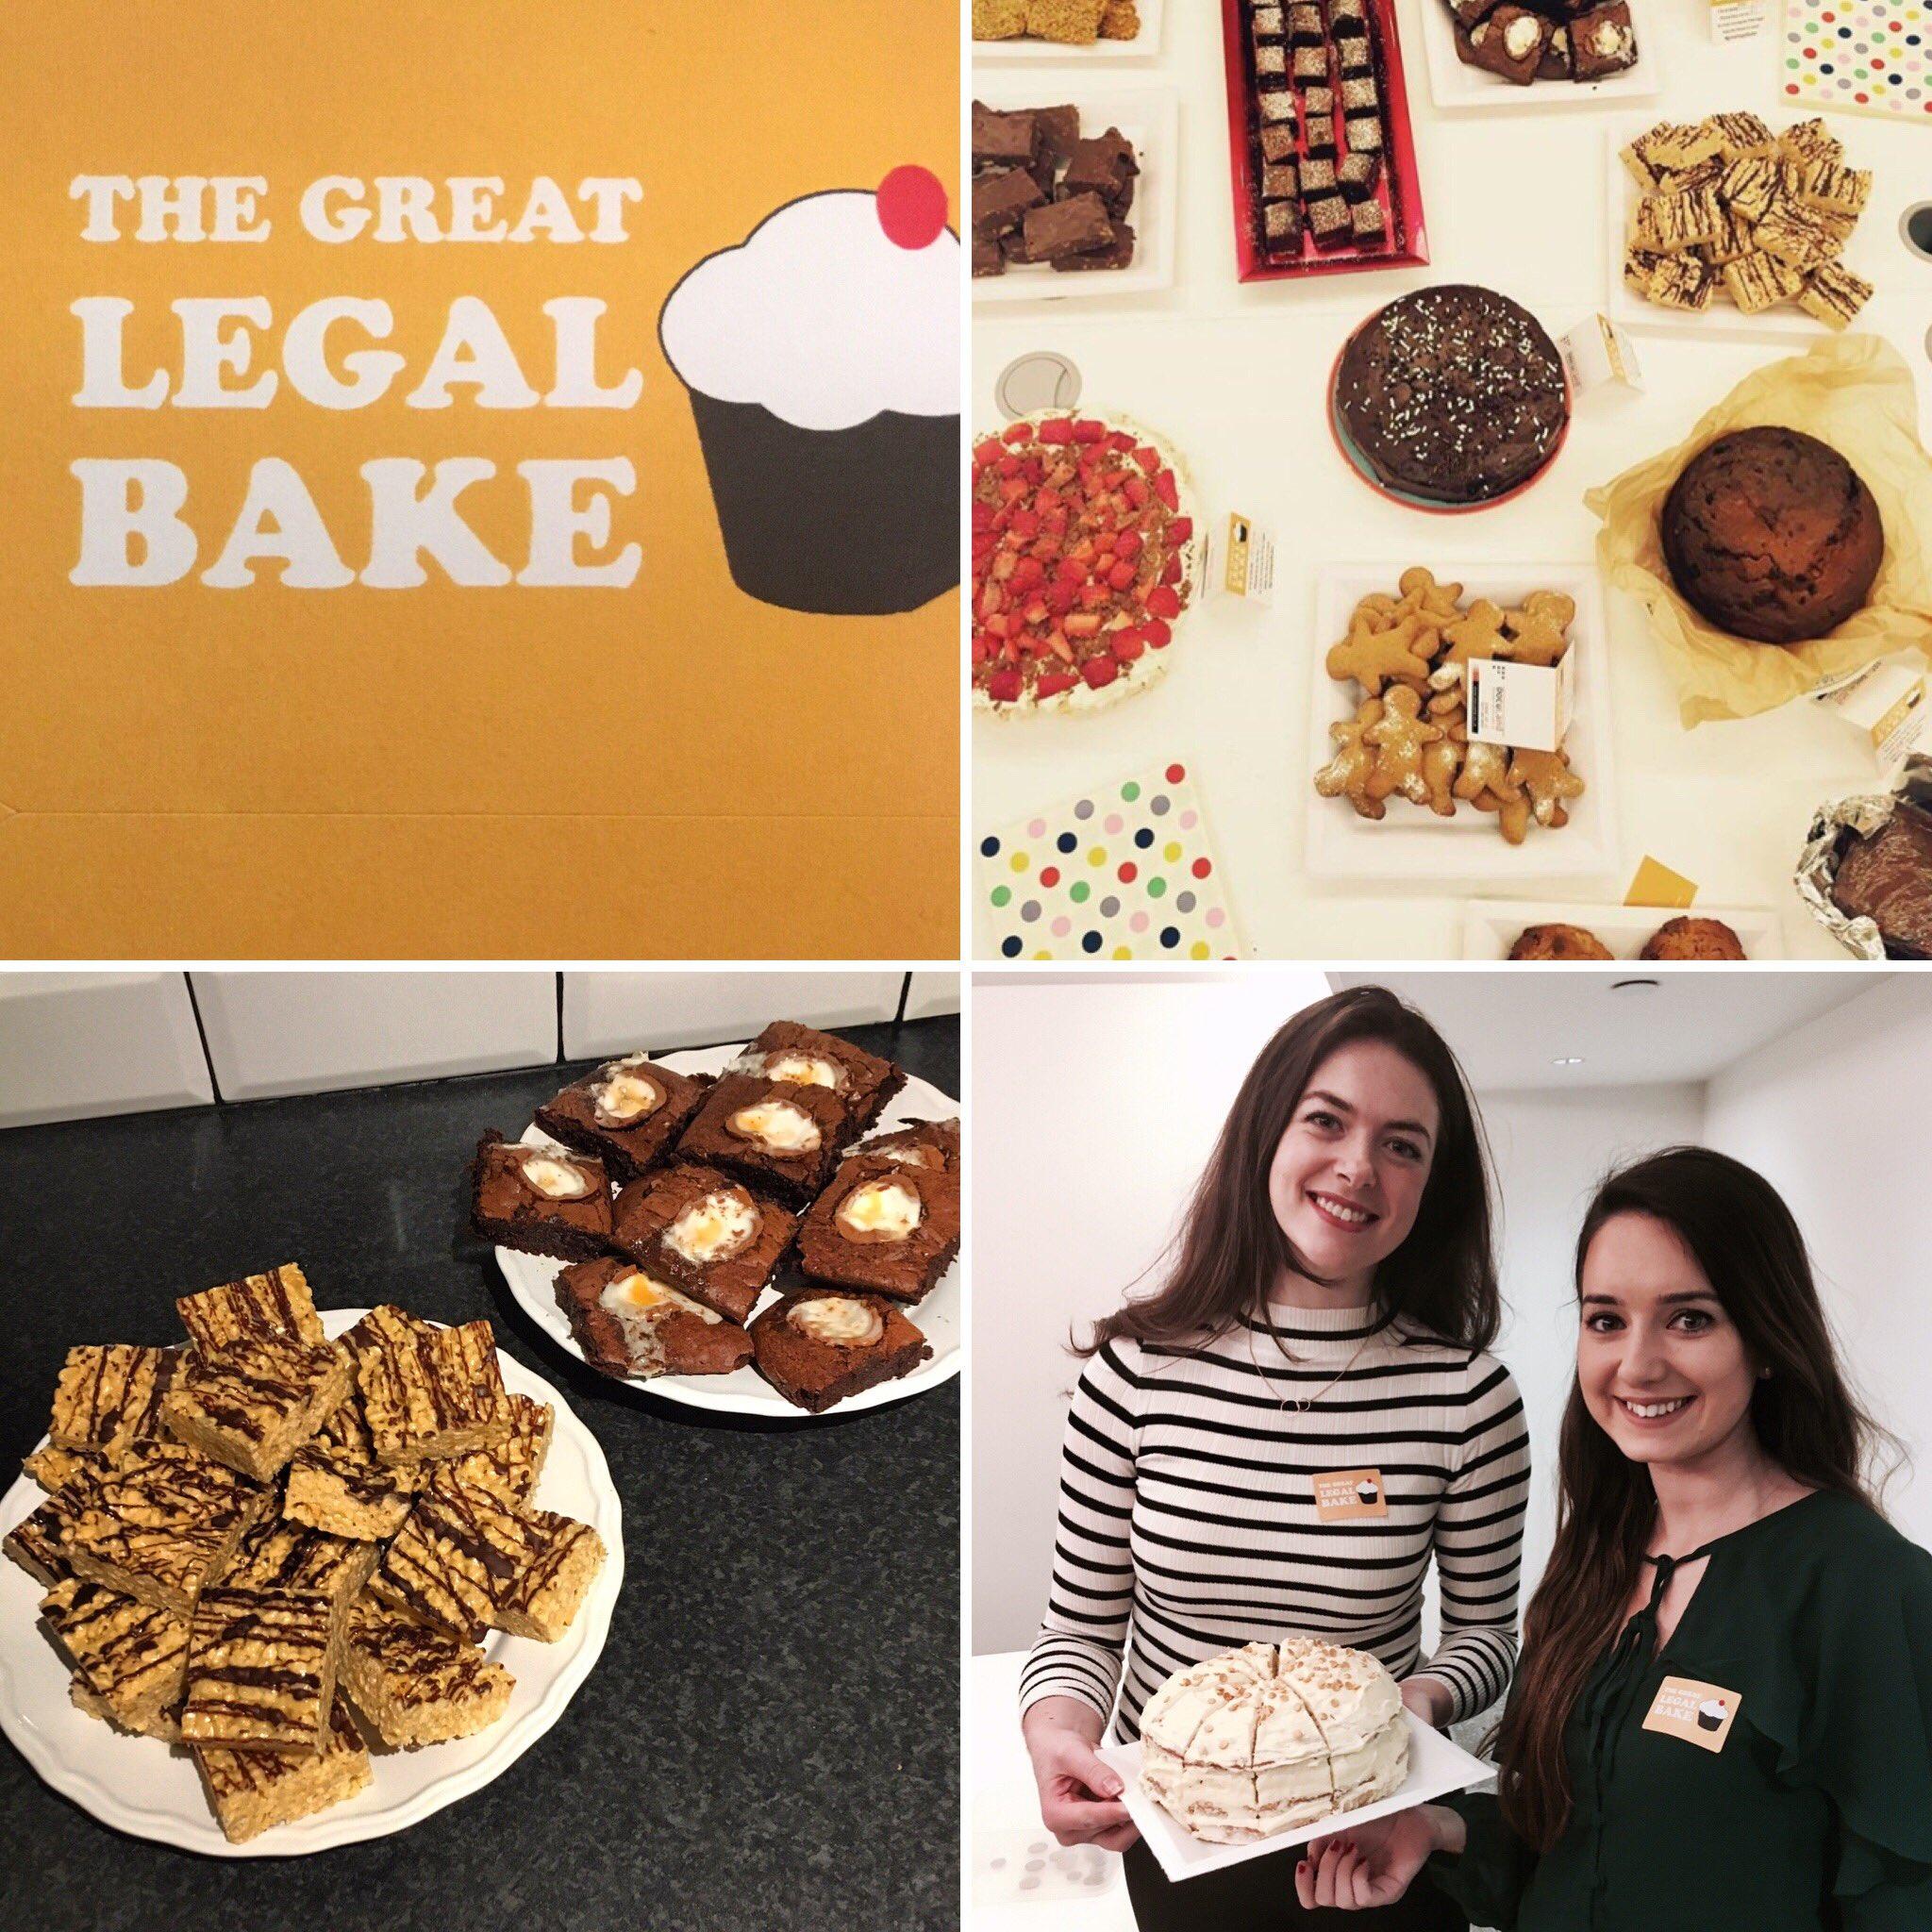 The @greatlegalbake is in full swing here! @londonlegal #greatlegalbake #legalbakeoff https://t.co/hzhXBITSYk